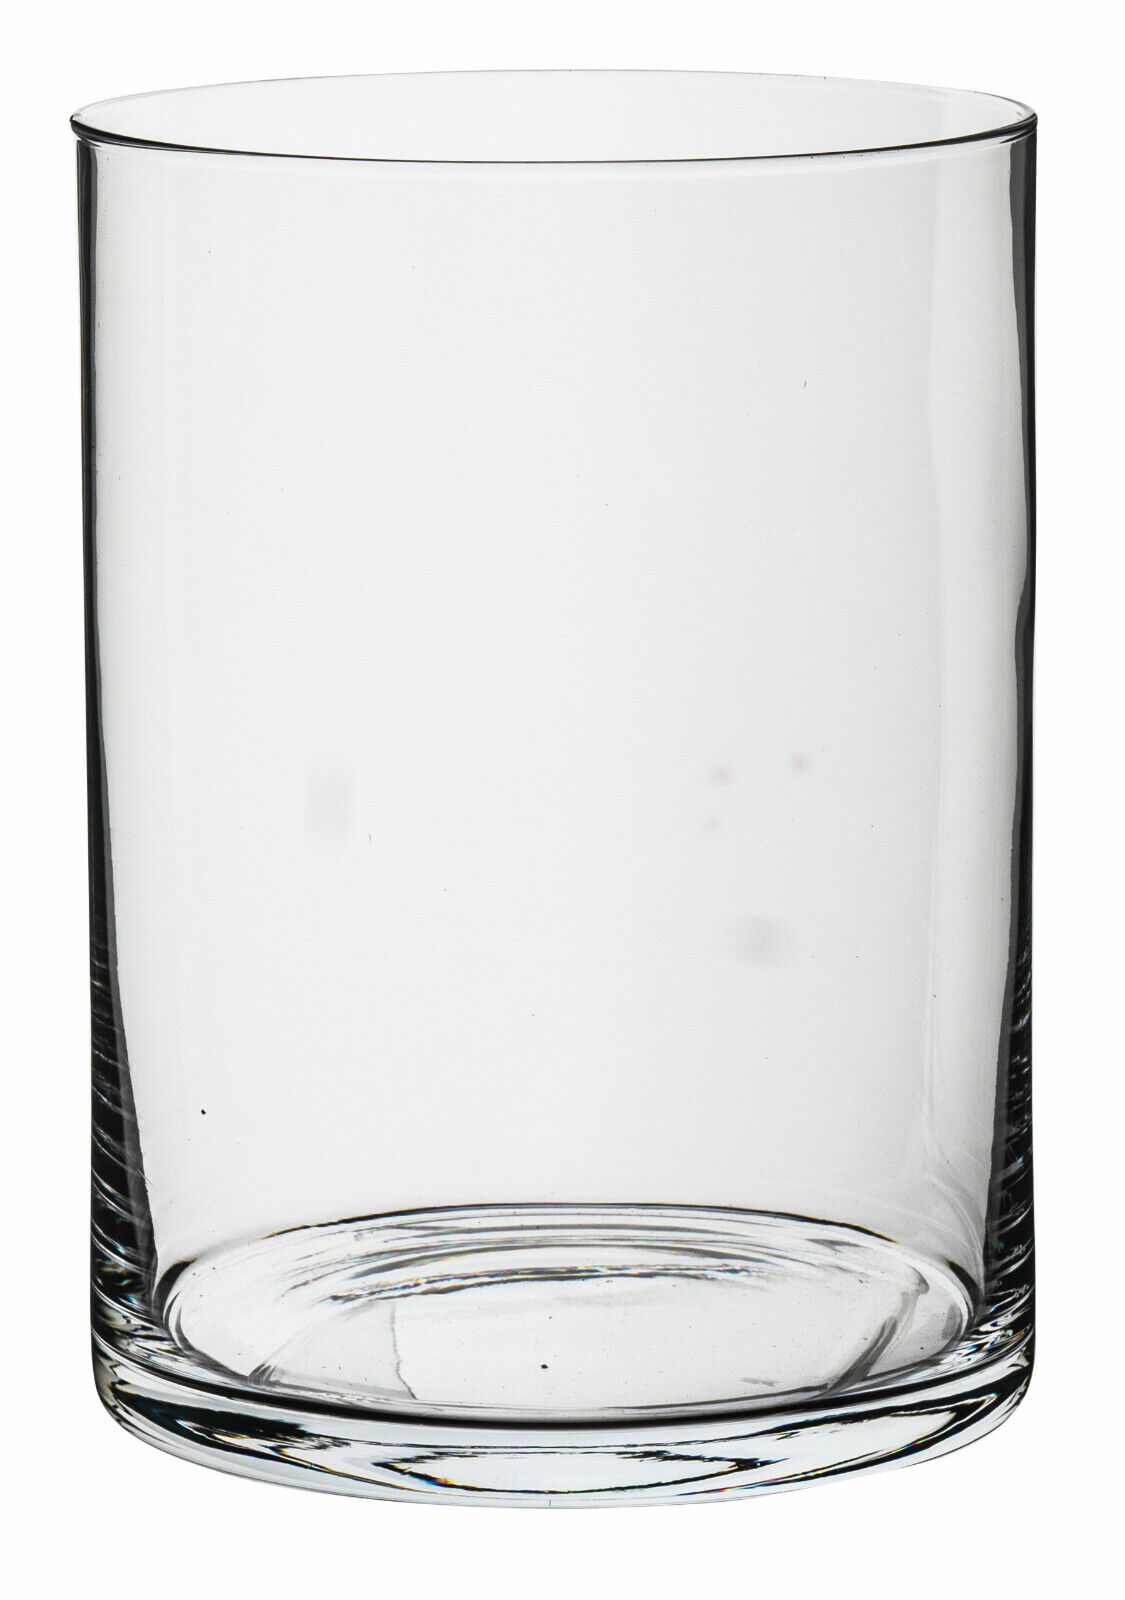 Glaszylinder Zylinder Glasvase H20cm